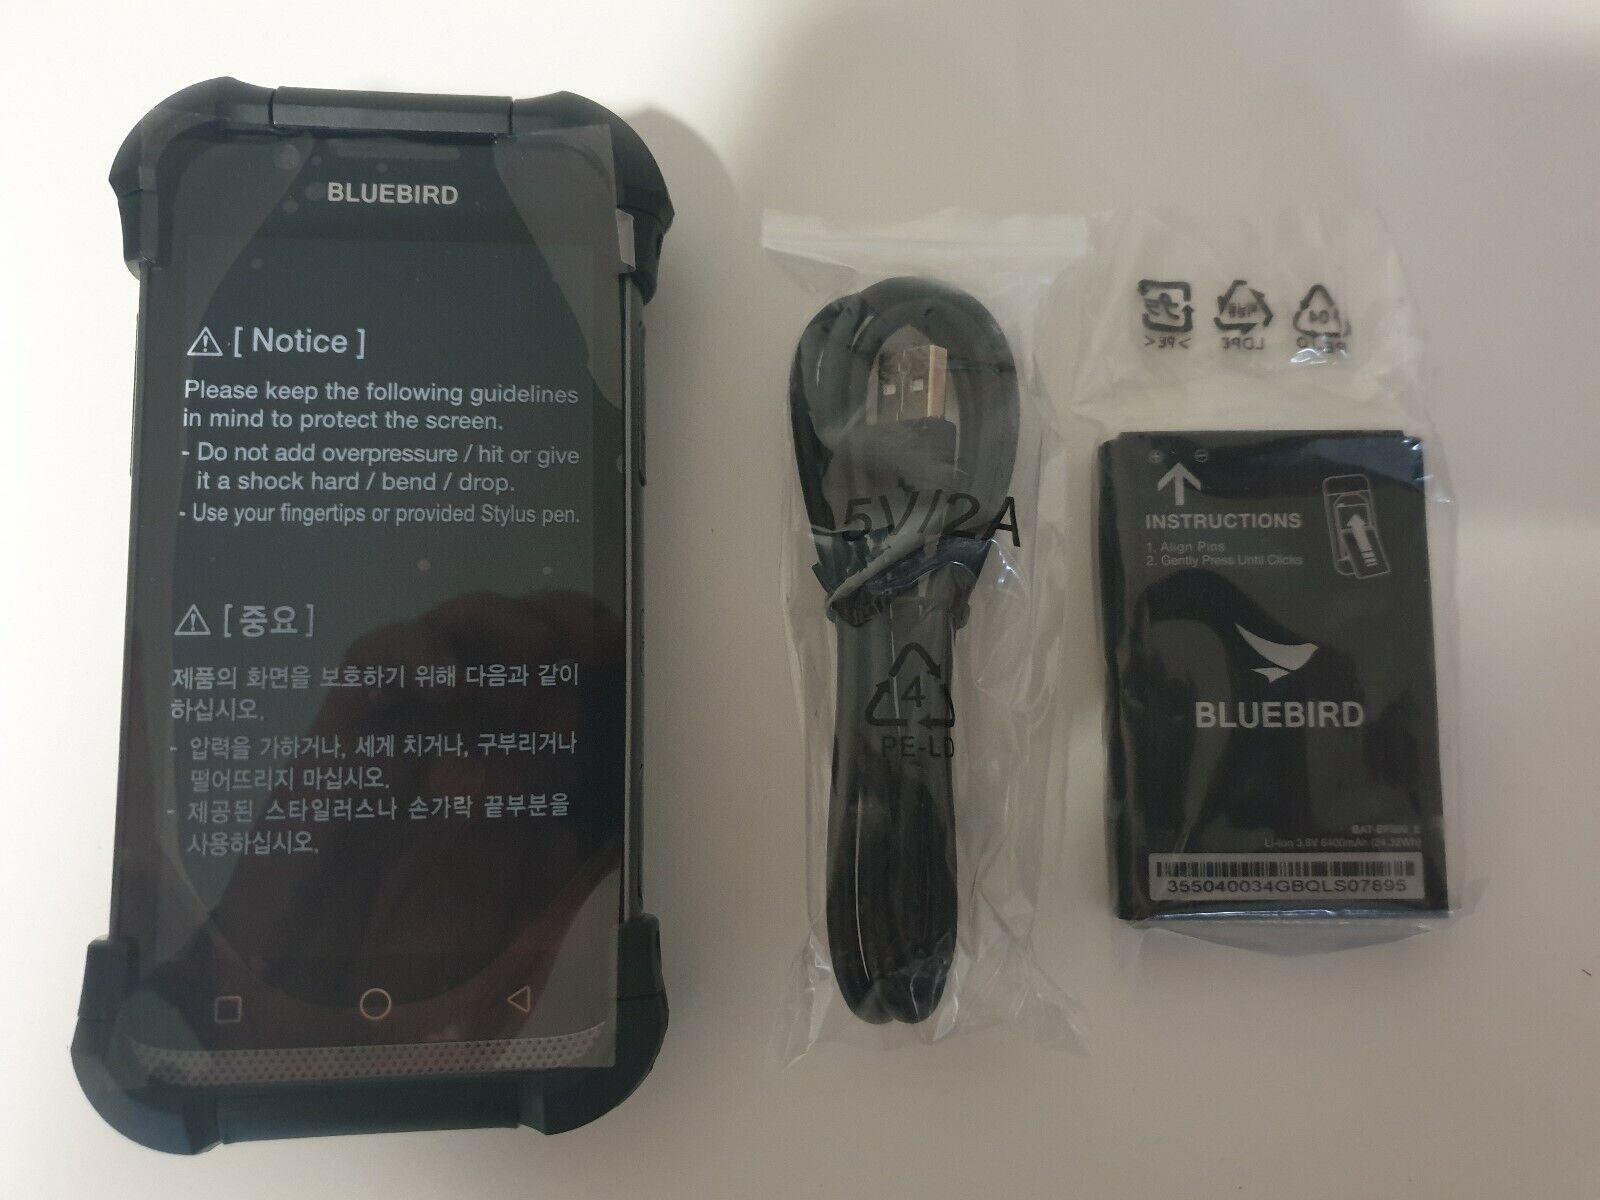 Bluebird EF500R  -  A4LD Handheld Mobile Computer Scanner NEU OVP TOP